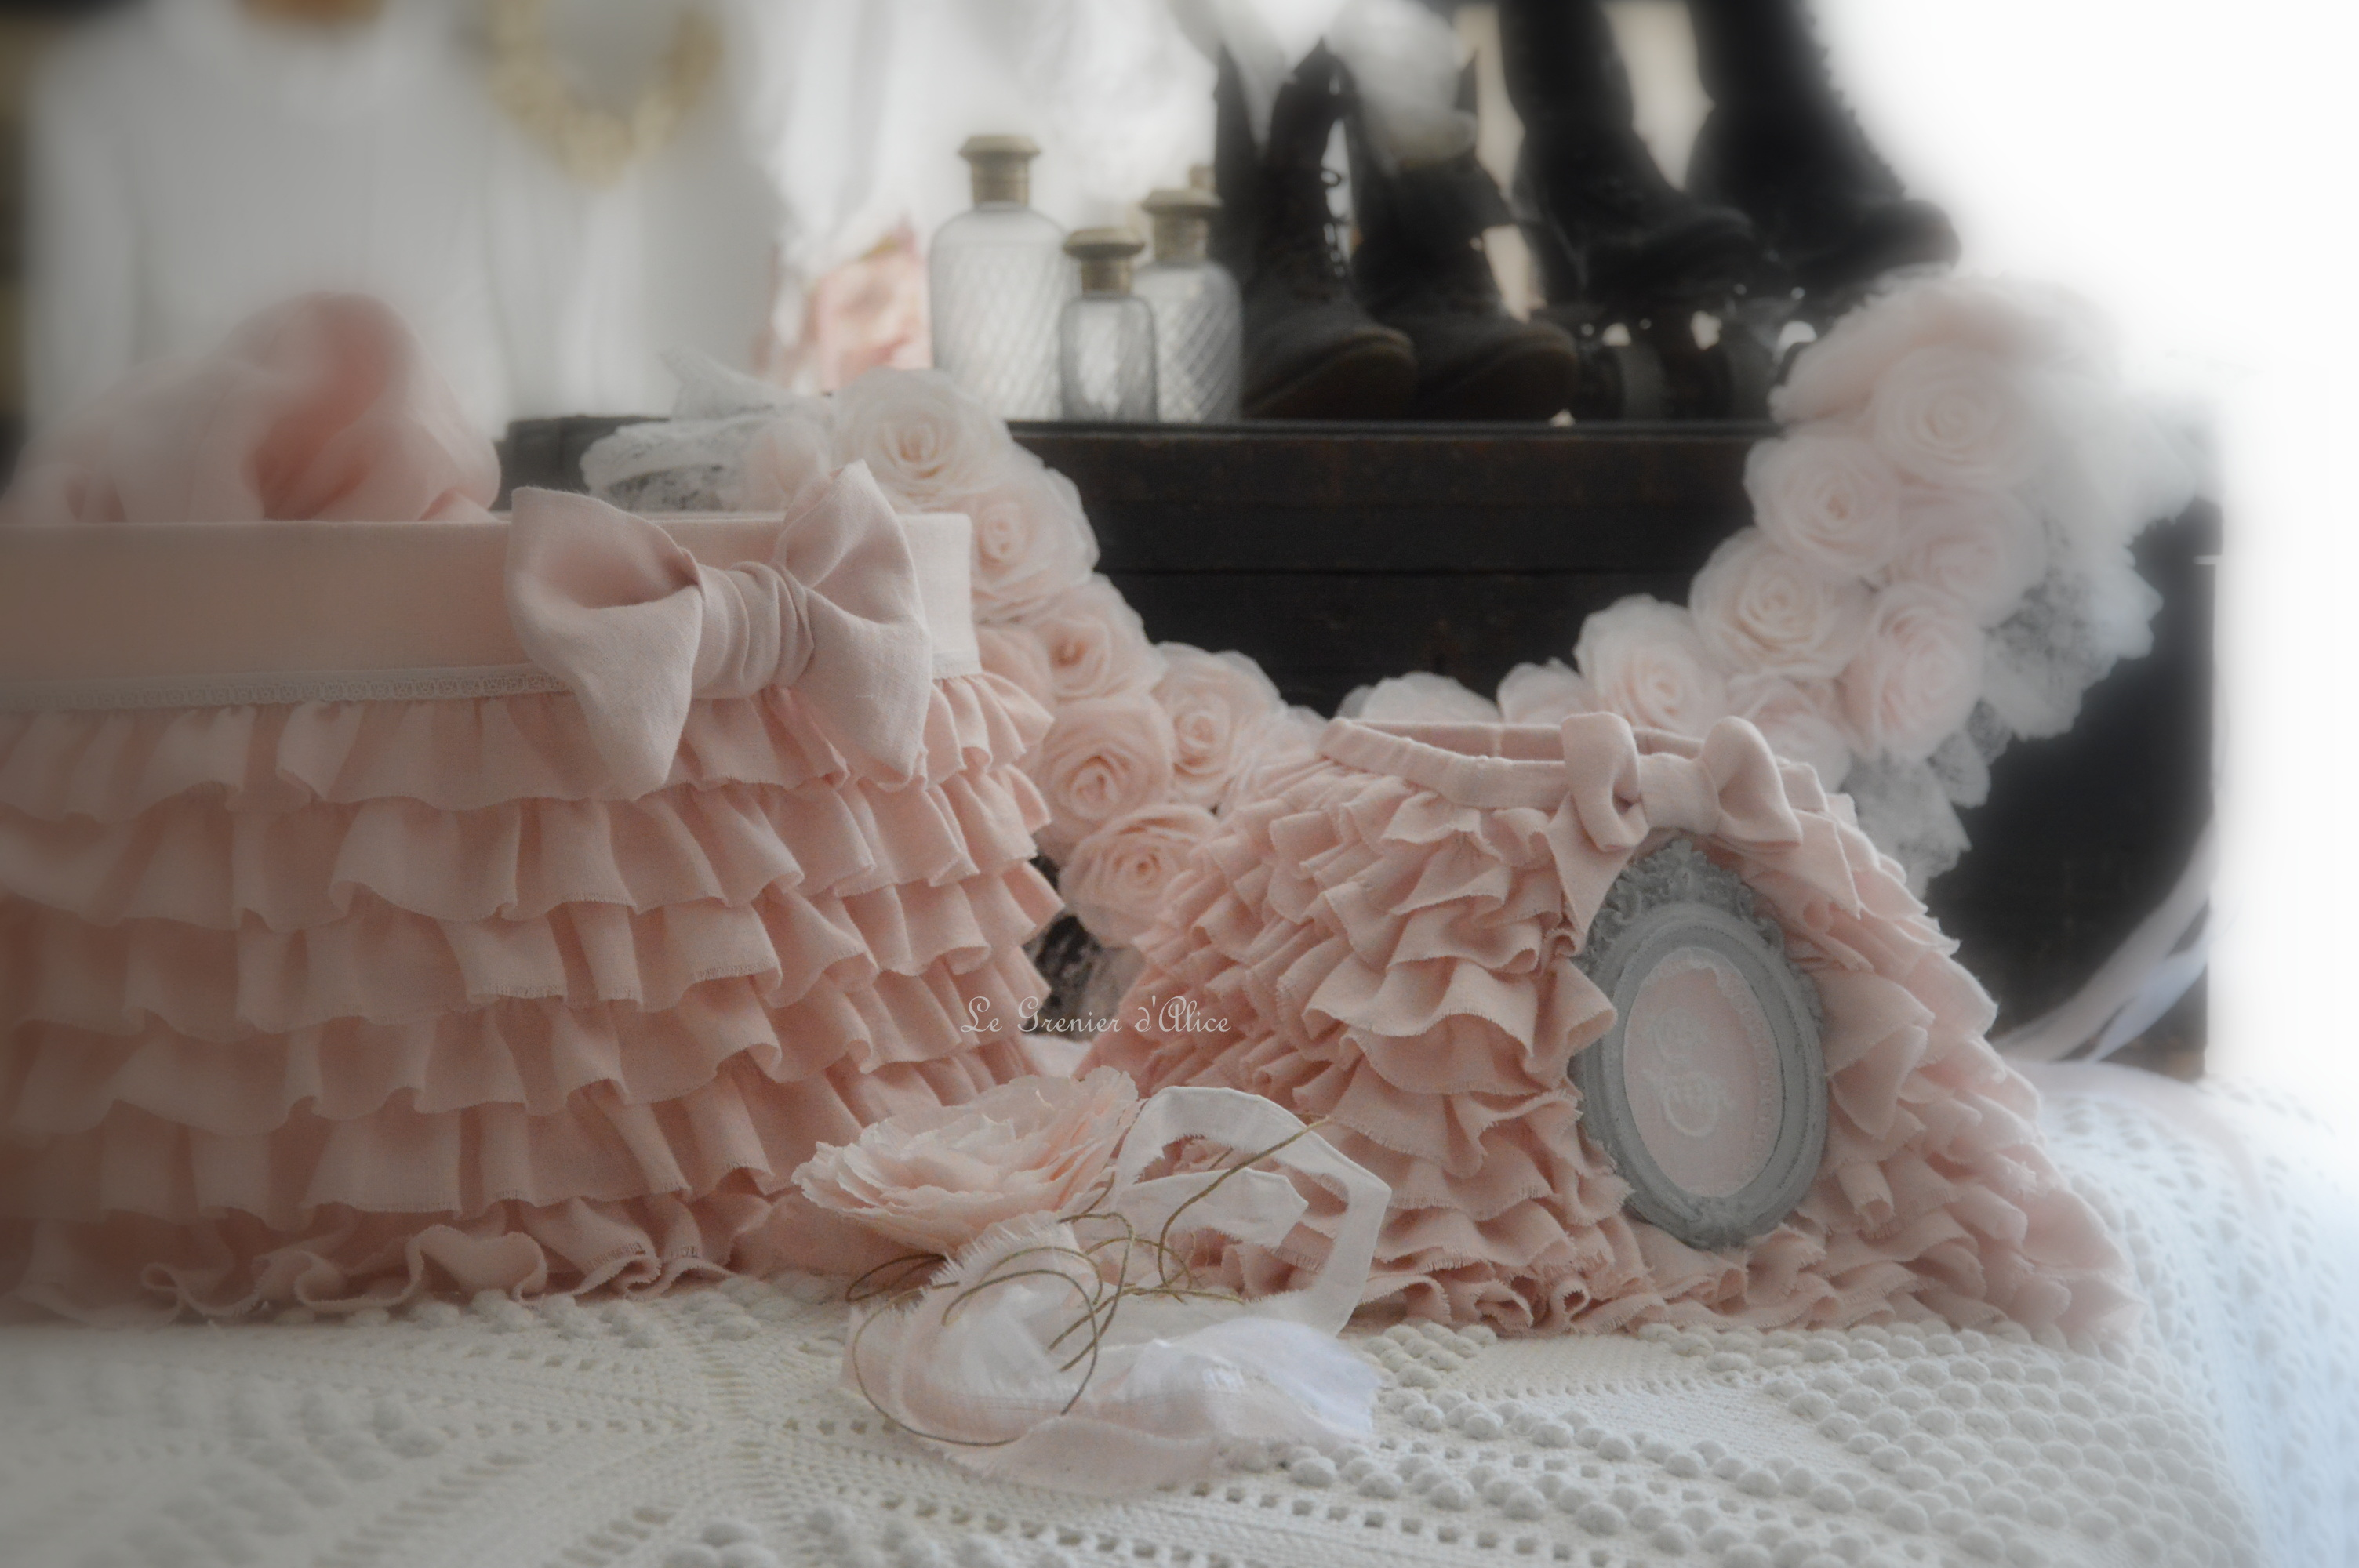 deco shabby charme elegant brocante dco brocante dcoration de charme dcoration vintage with. Black Bedroom Furniture Sets. Home Design Ideas